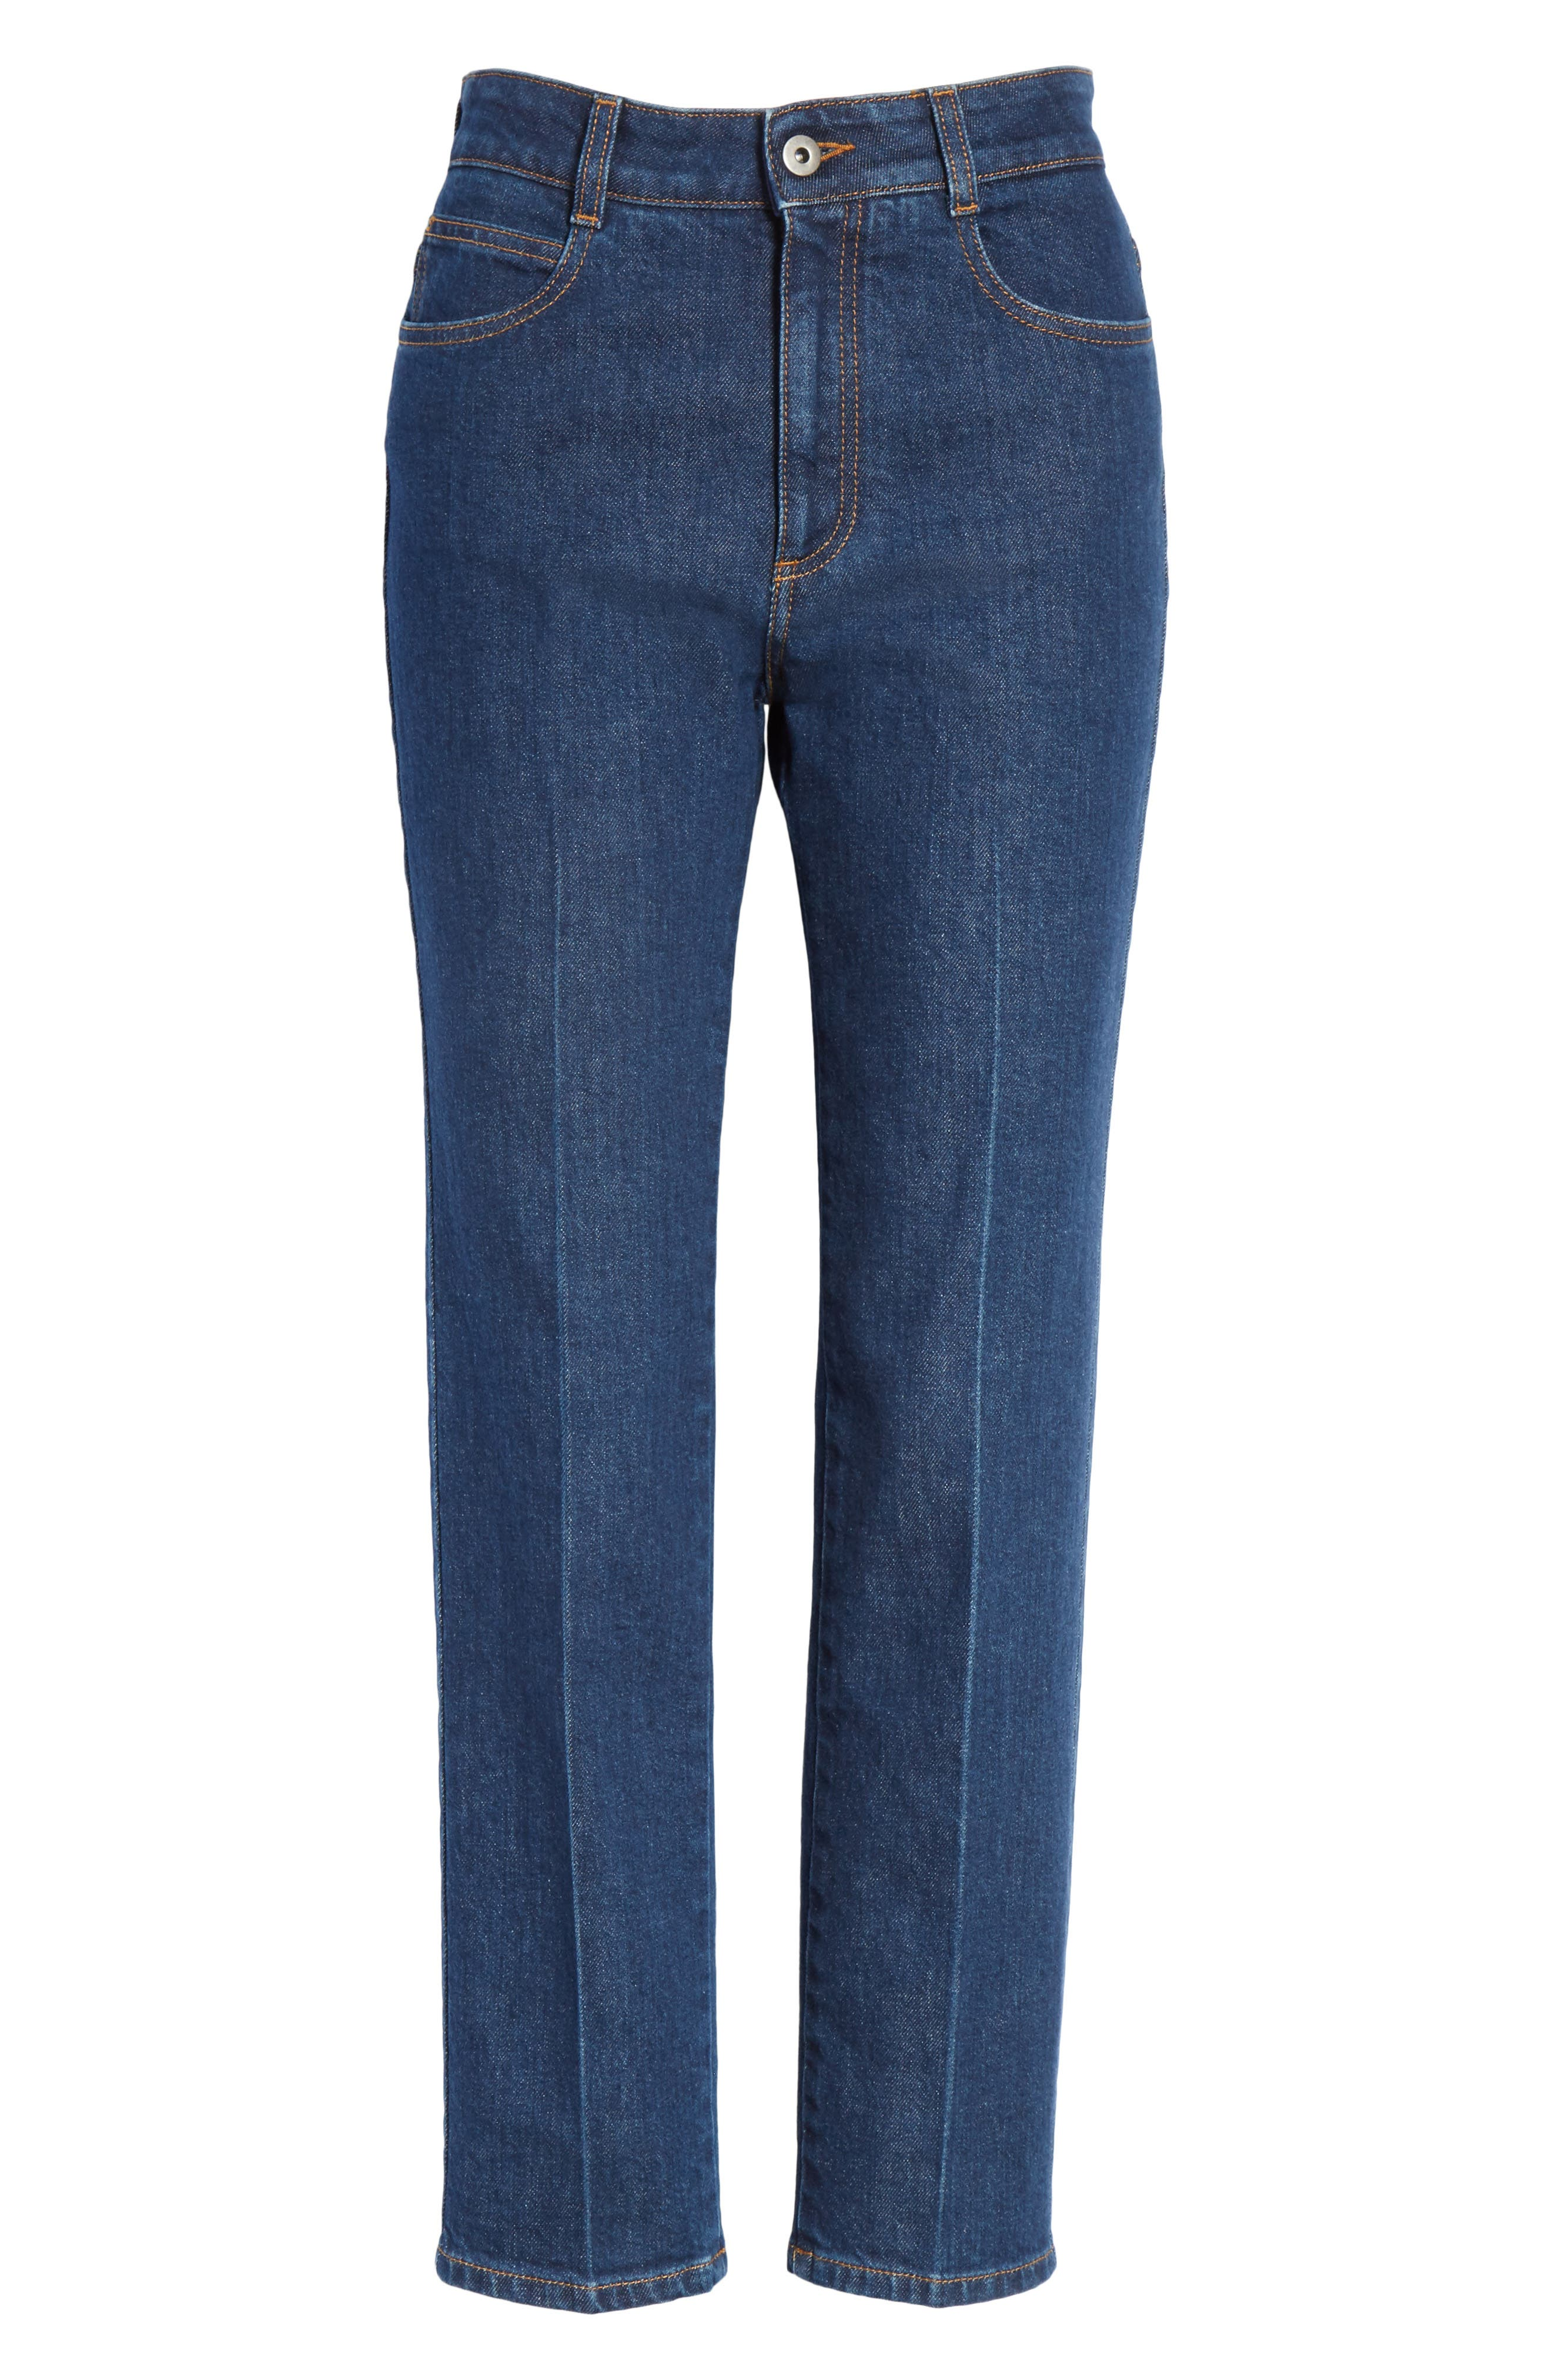 Crop Skinny Jeans,                             Alternate thumbnail 6, color,                             465